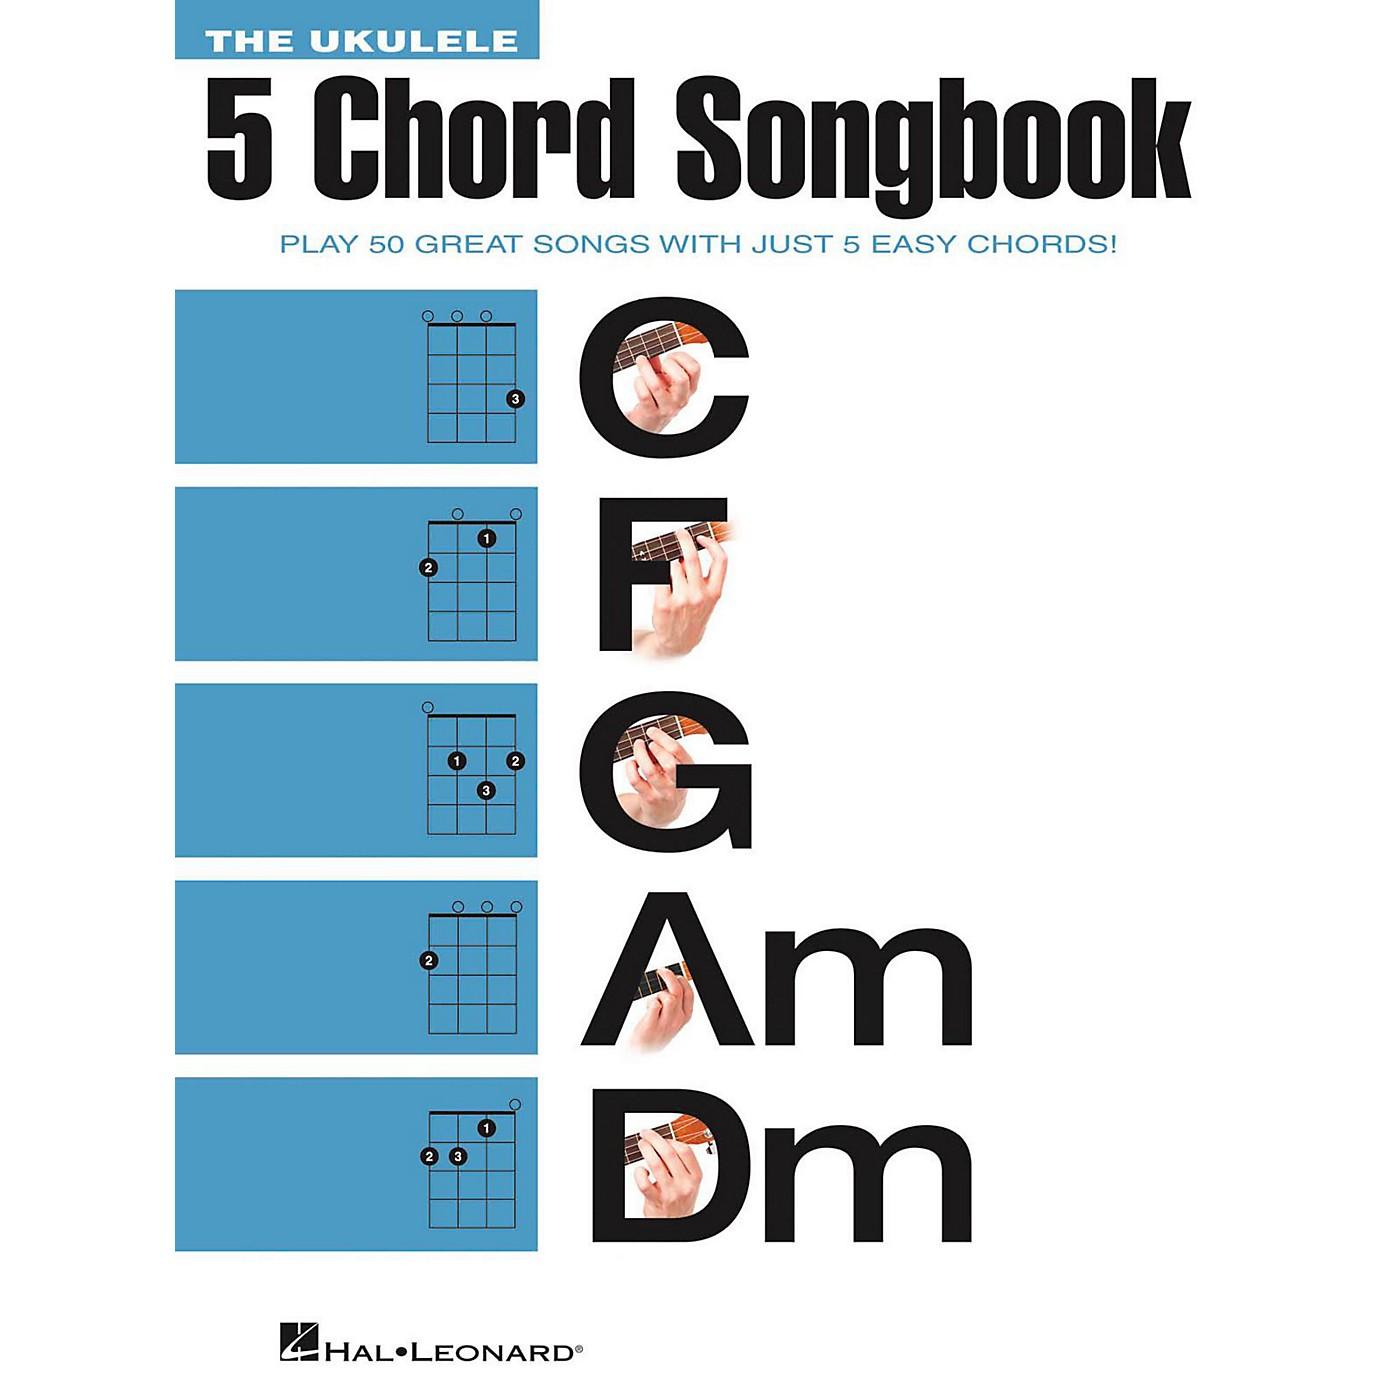 Hal Leonard The Ukulele 5 Chord Songbook (C-F-G-Am-Dm) thumbnail